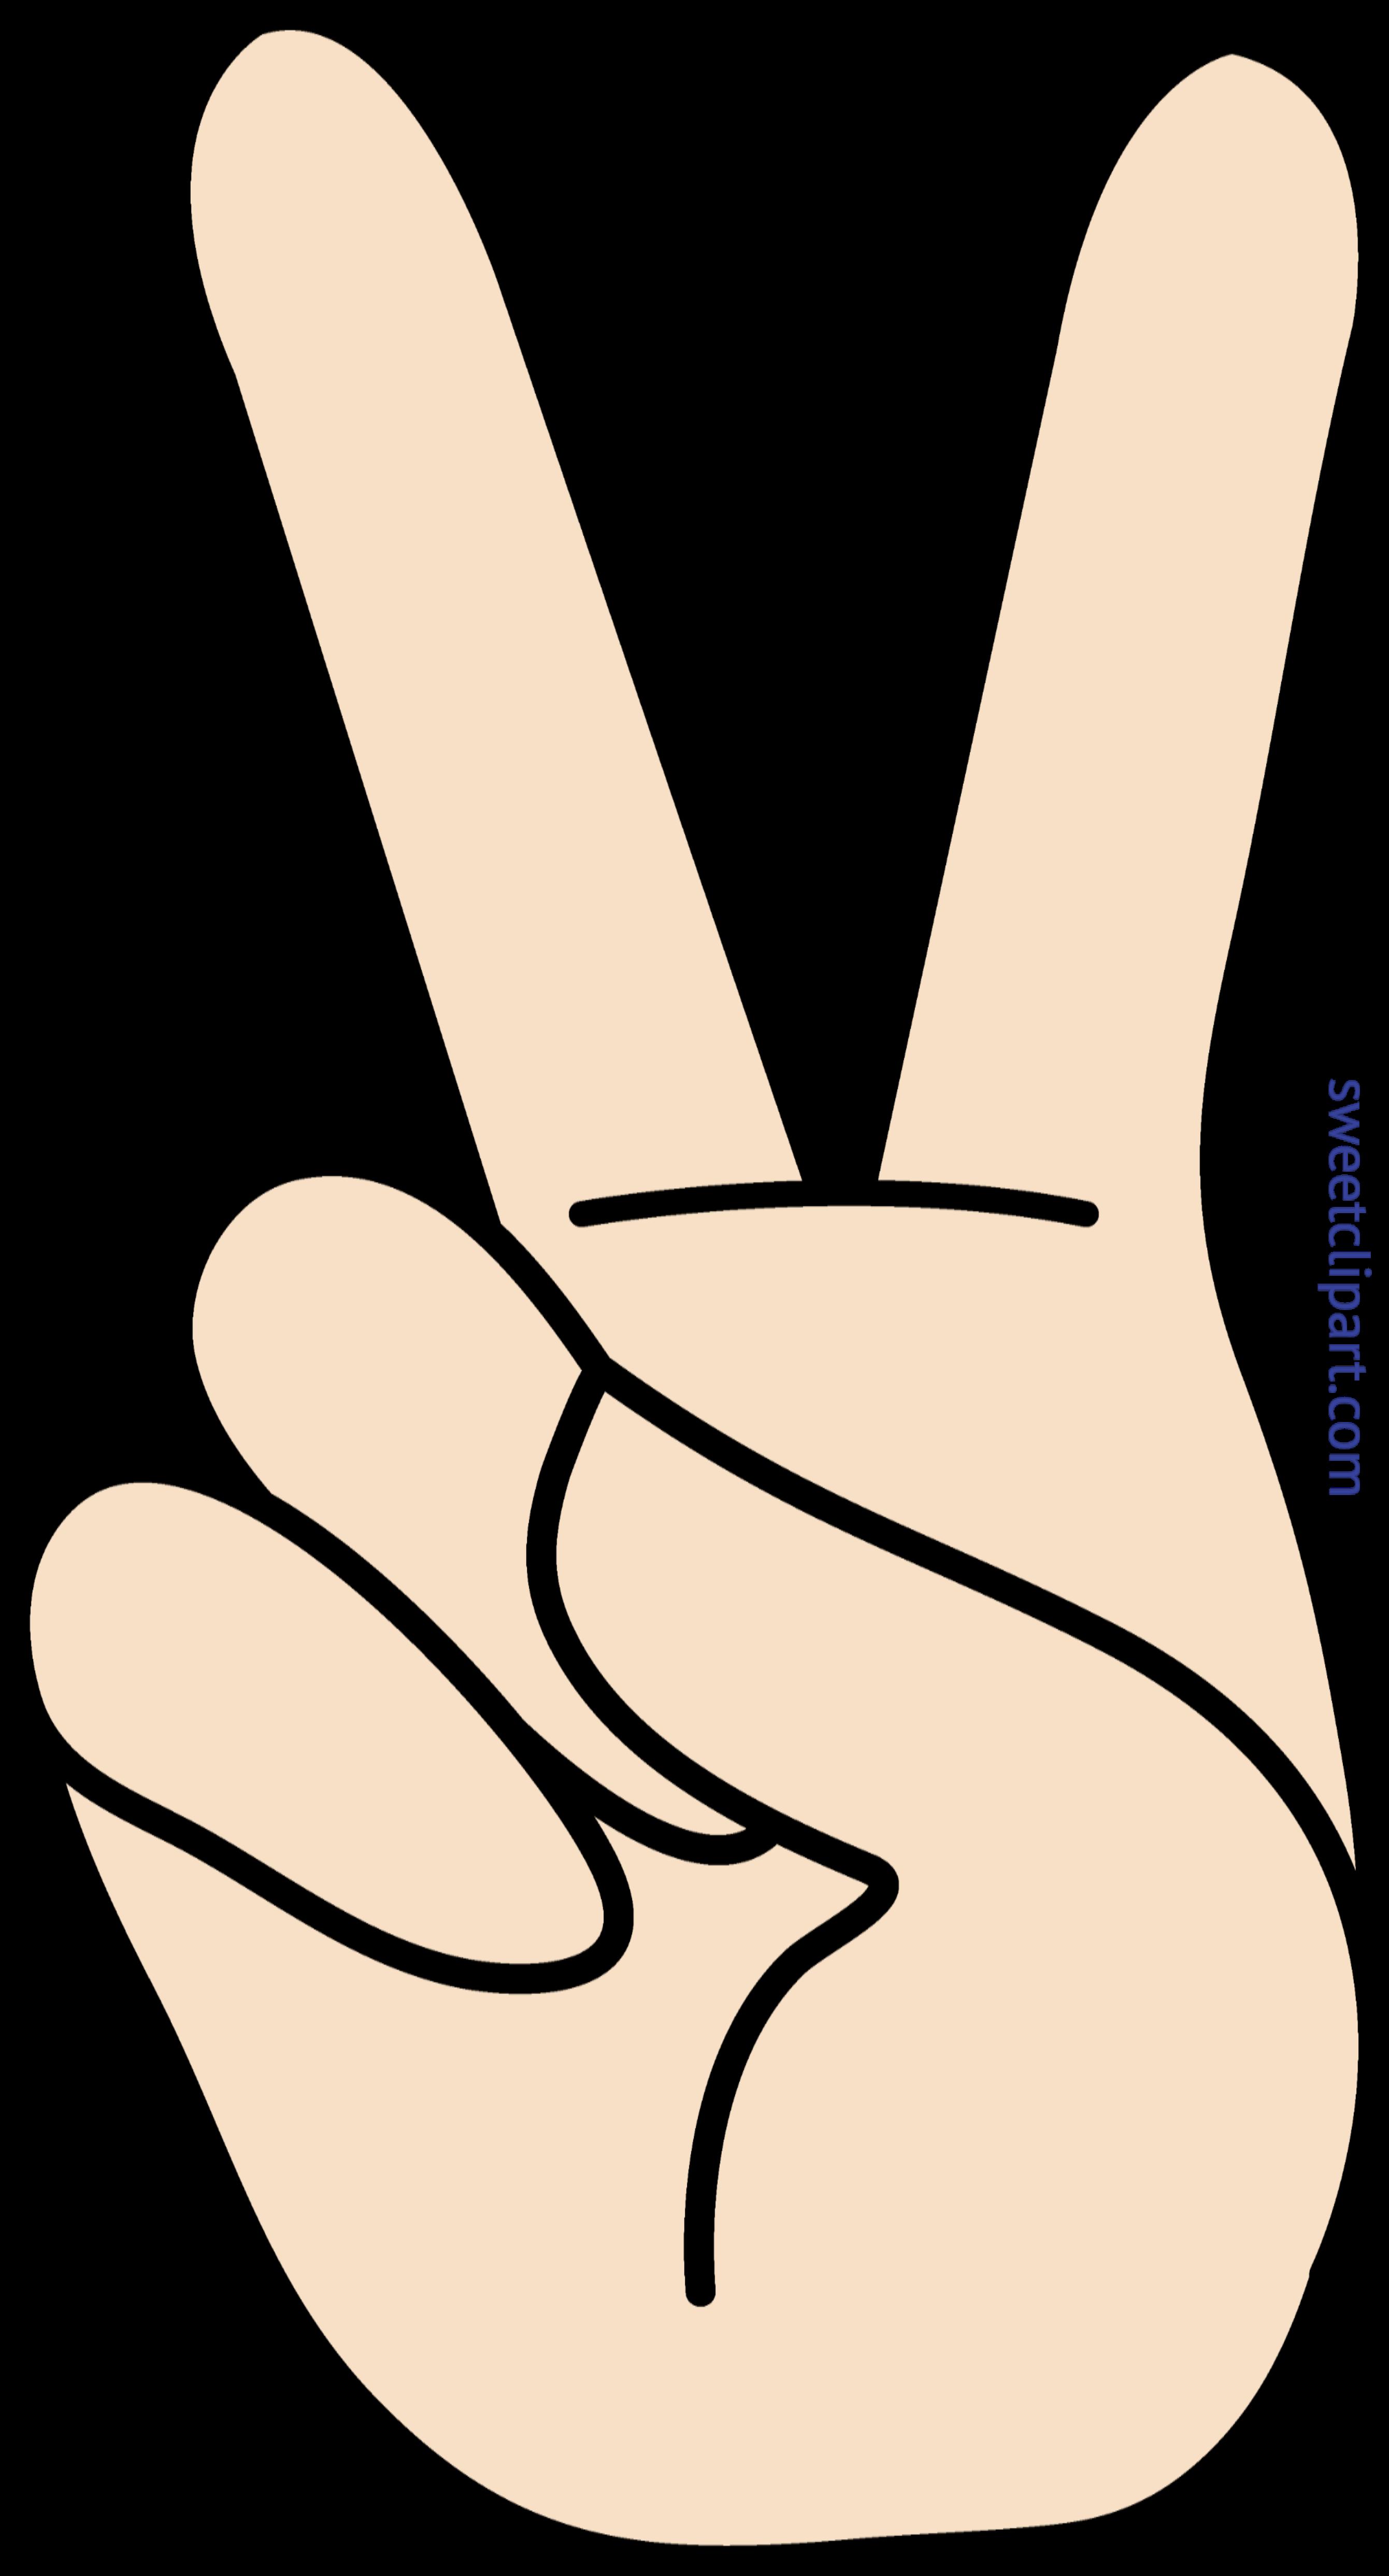 Honesty clipart peace. Hand sign clip art